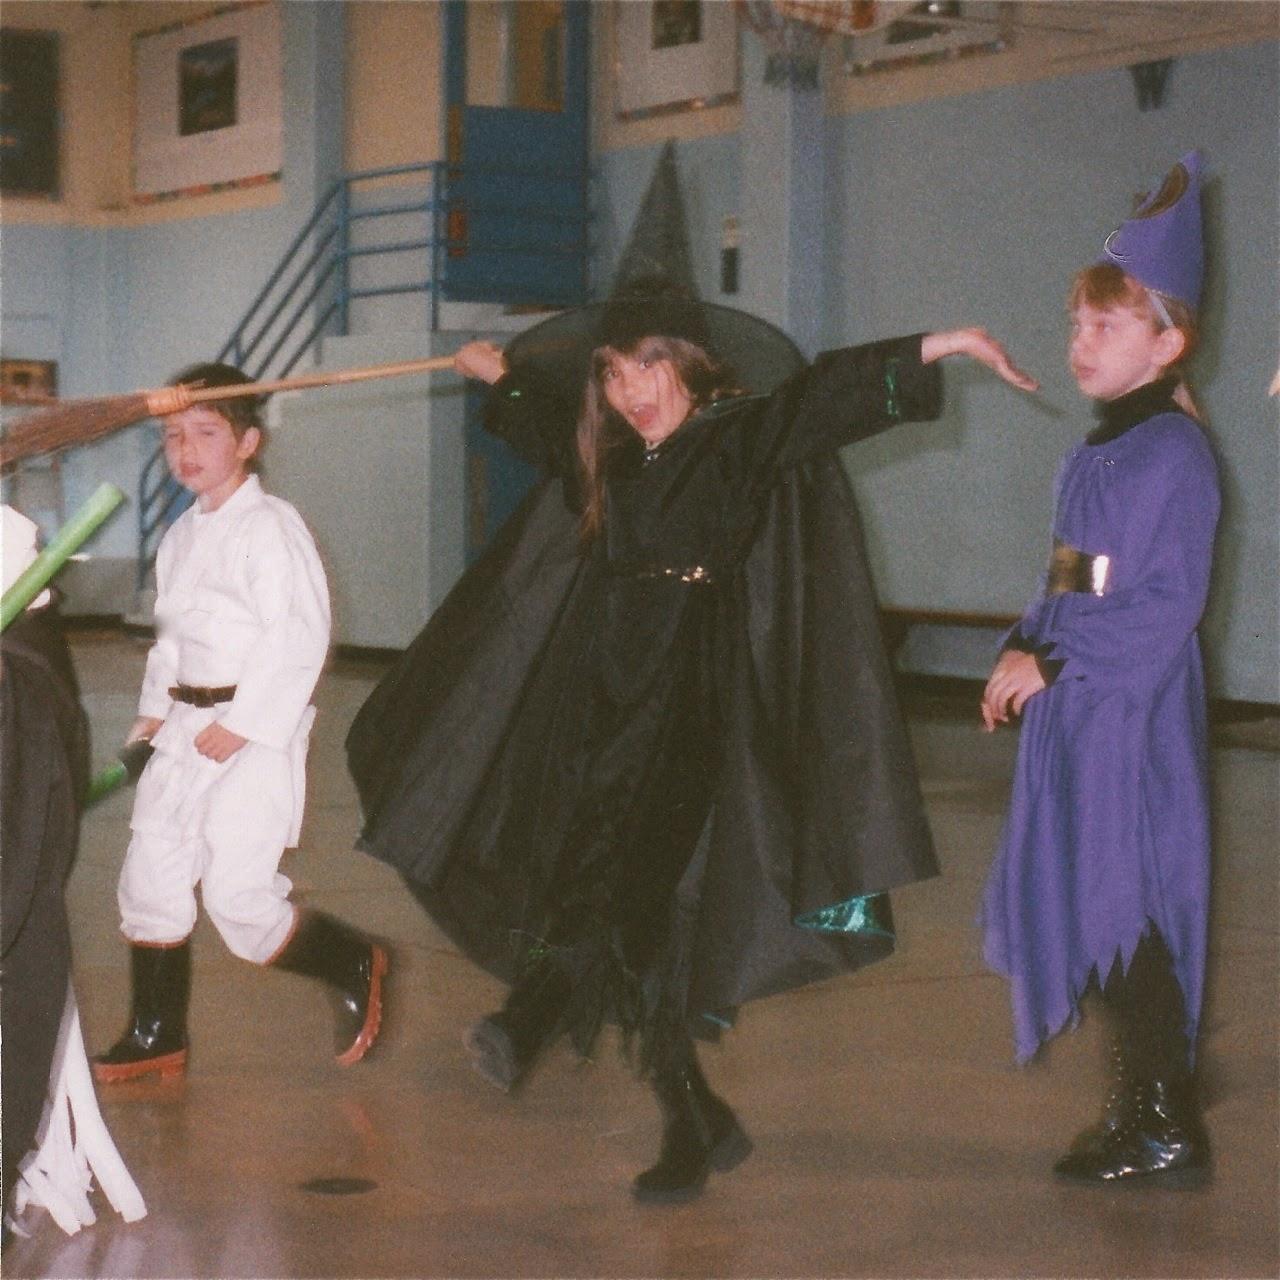 Gym, Gymnasium, witch, jedi, students, 3rd grade, third, dancing witch, Oregon